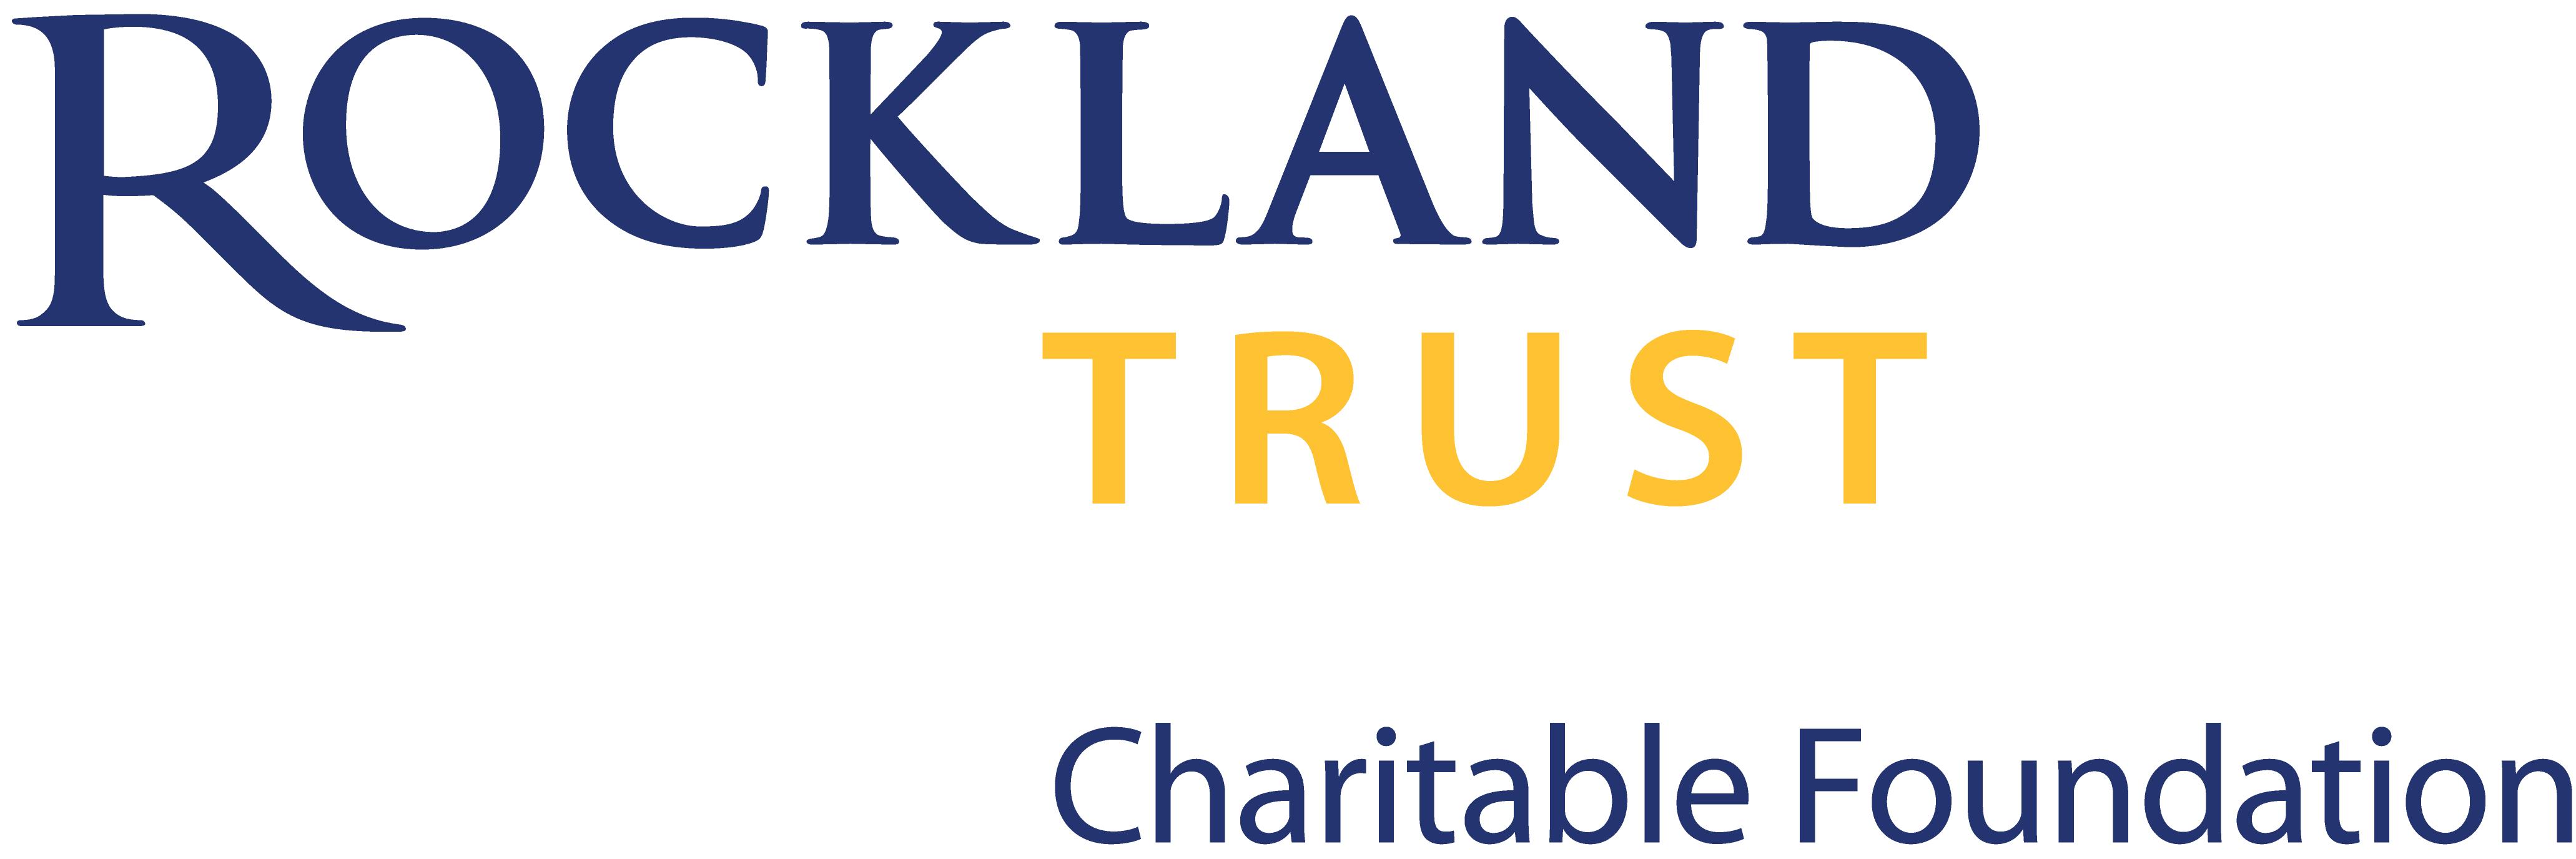 RT_charitable-foundation_pos-2c_pref20190422094445